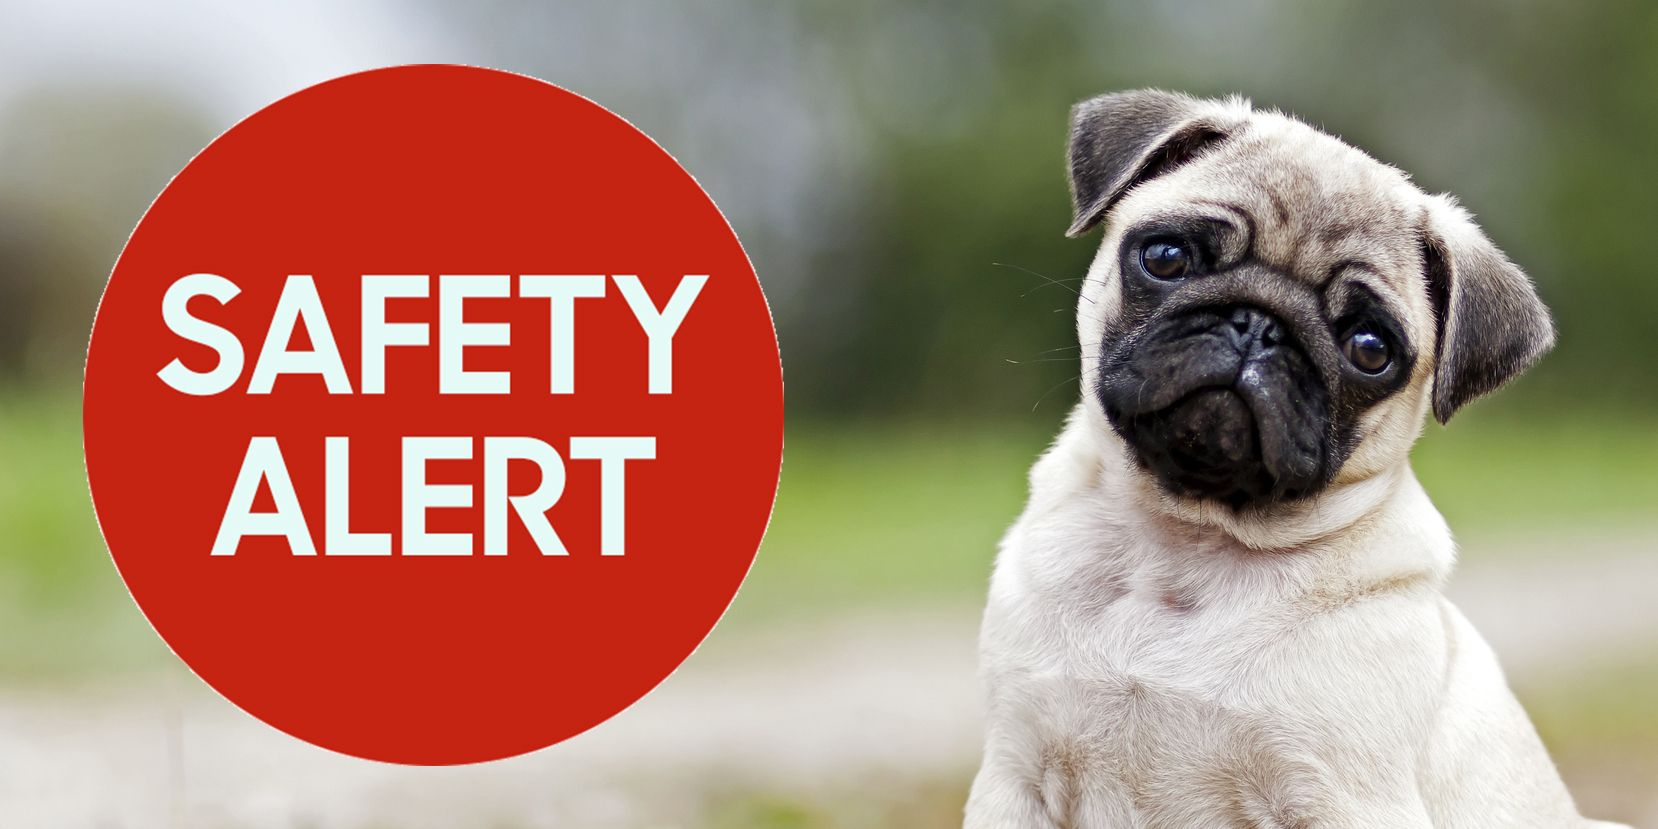 IKEA Recalls Lurvig Pet Water Dispensers After 2 Dogs Die